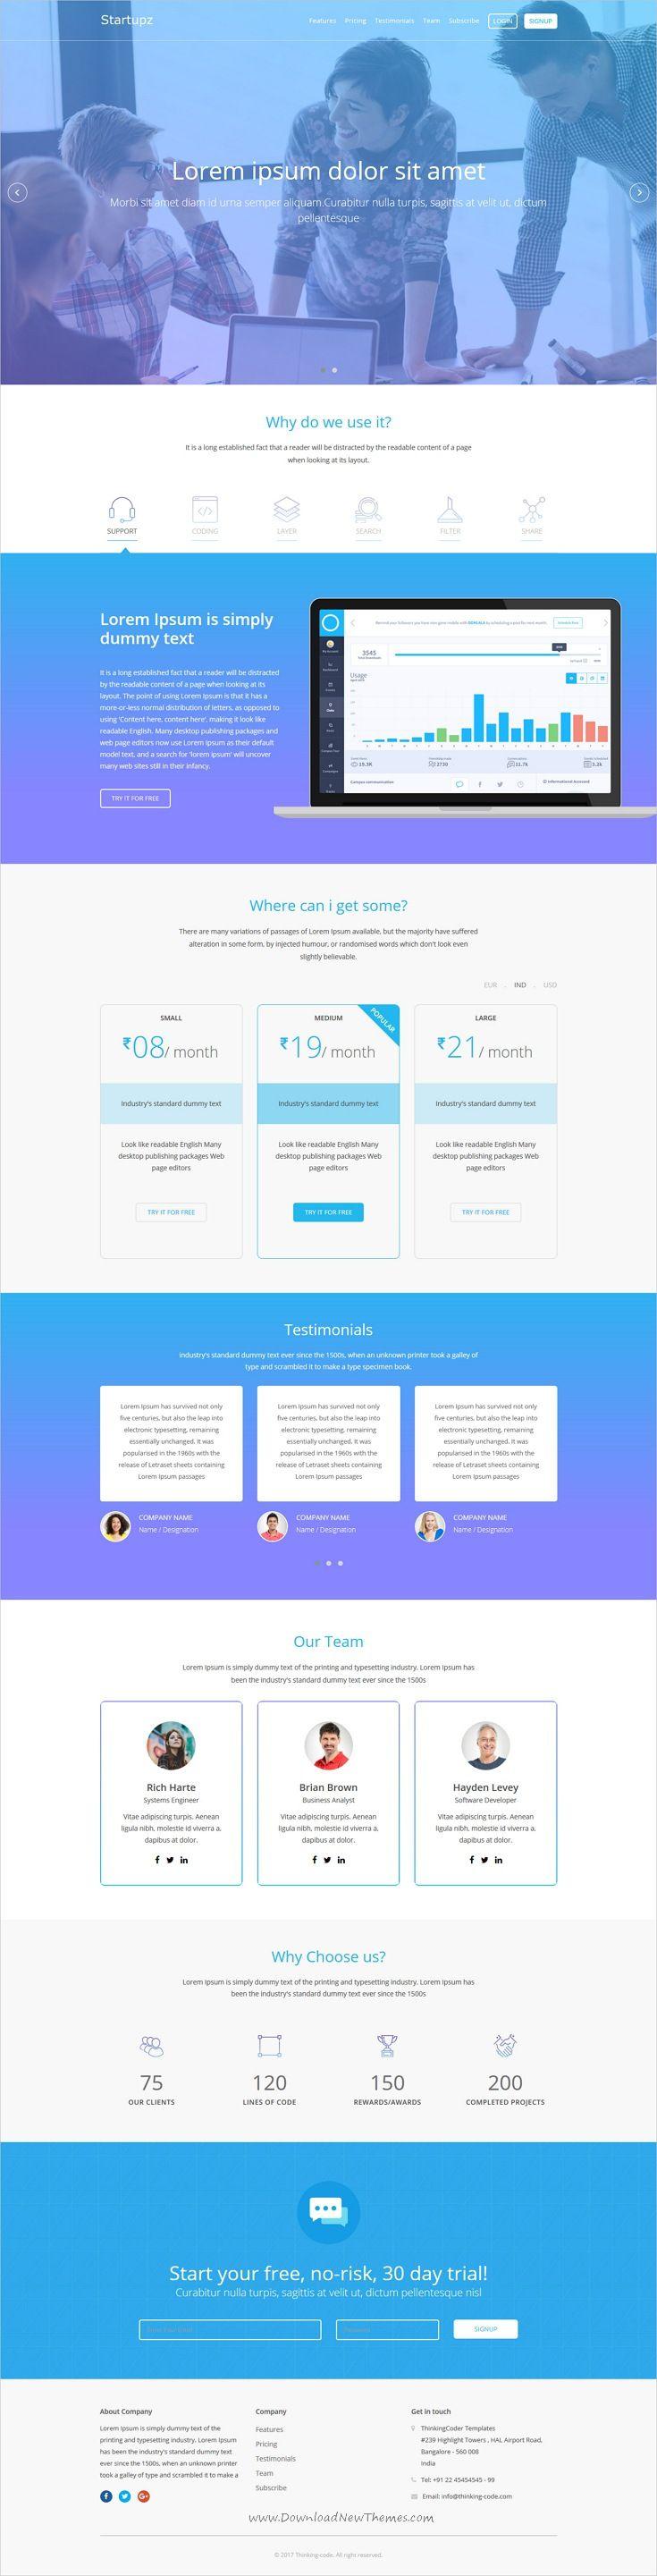 Startupz - App/SAAS Landing Page Template   Startups